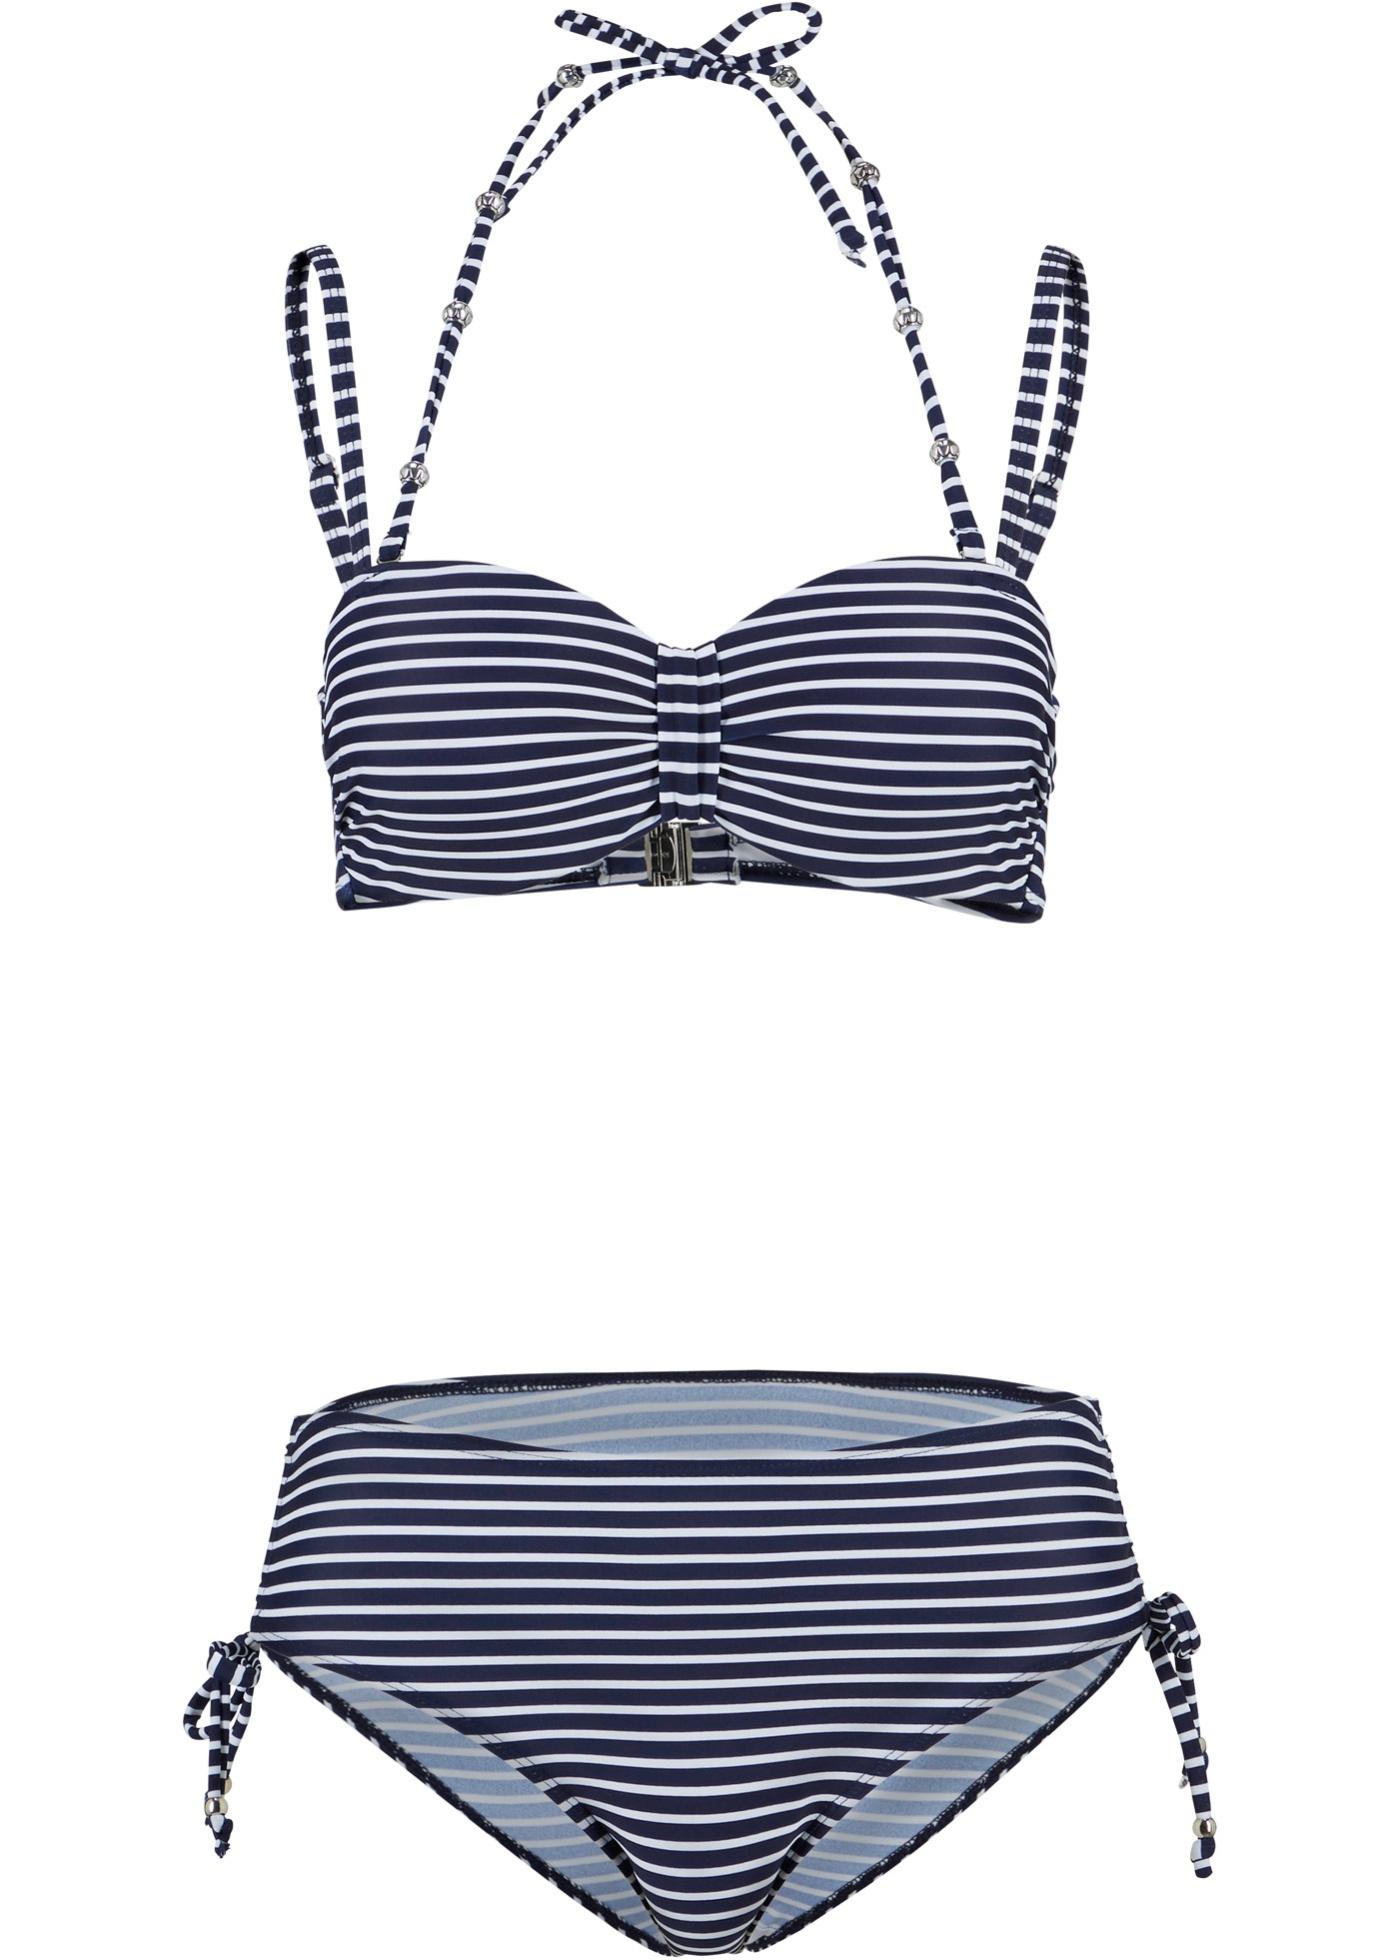 Bademode - Bügel Bikini (2 tlg. Set) › bonprix › blau  - Onlineshop Bonprix